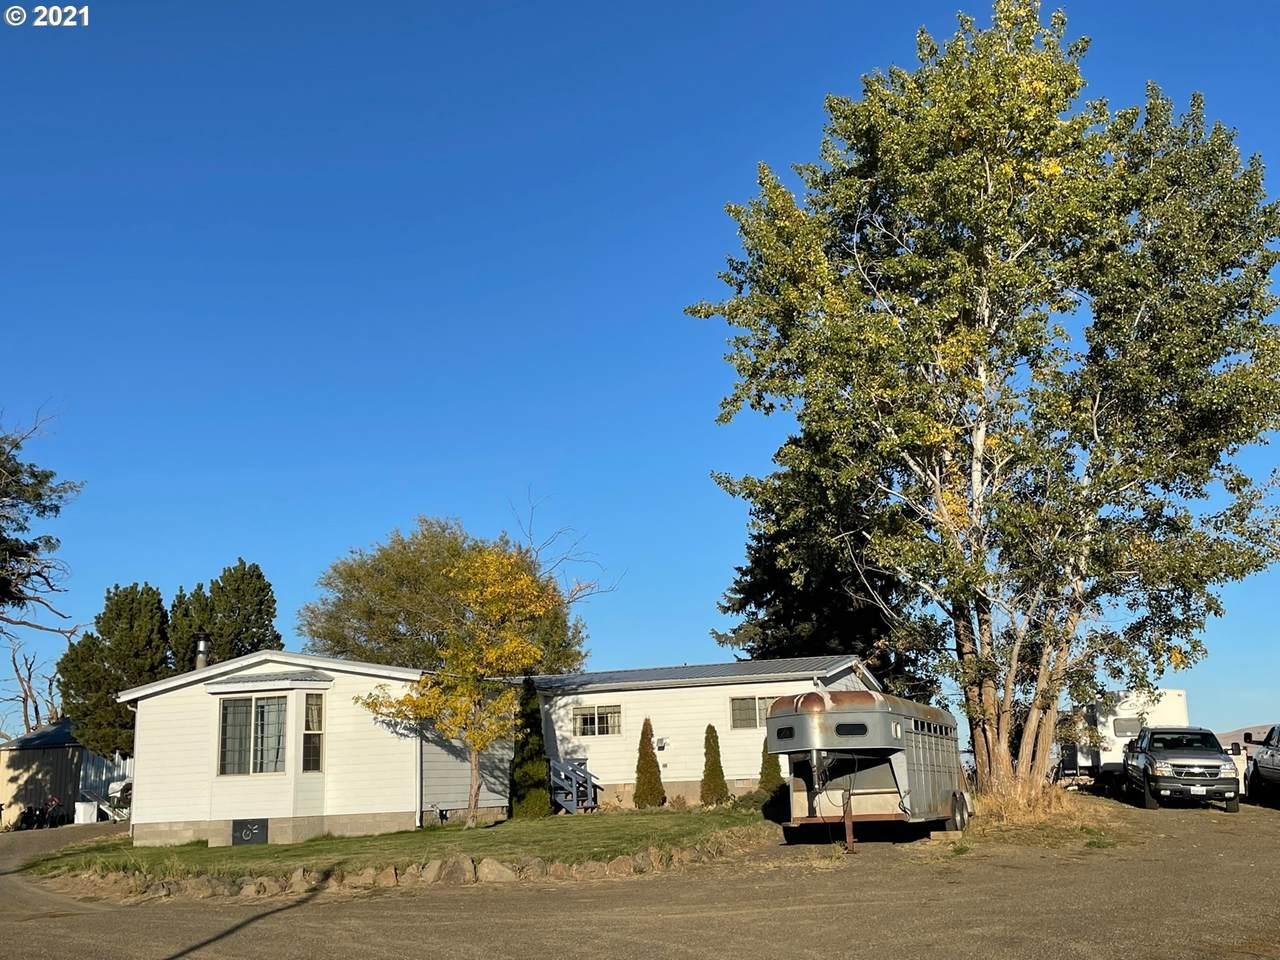 464 Simcoe Mtn Rd - Photo 1